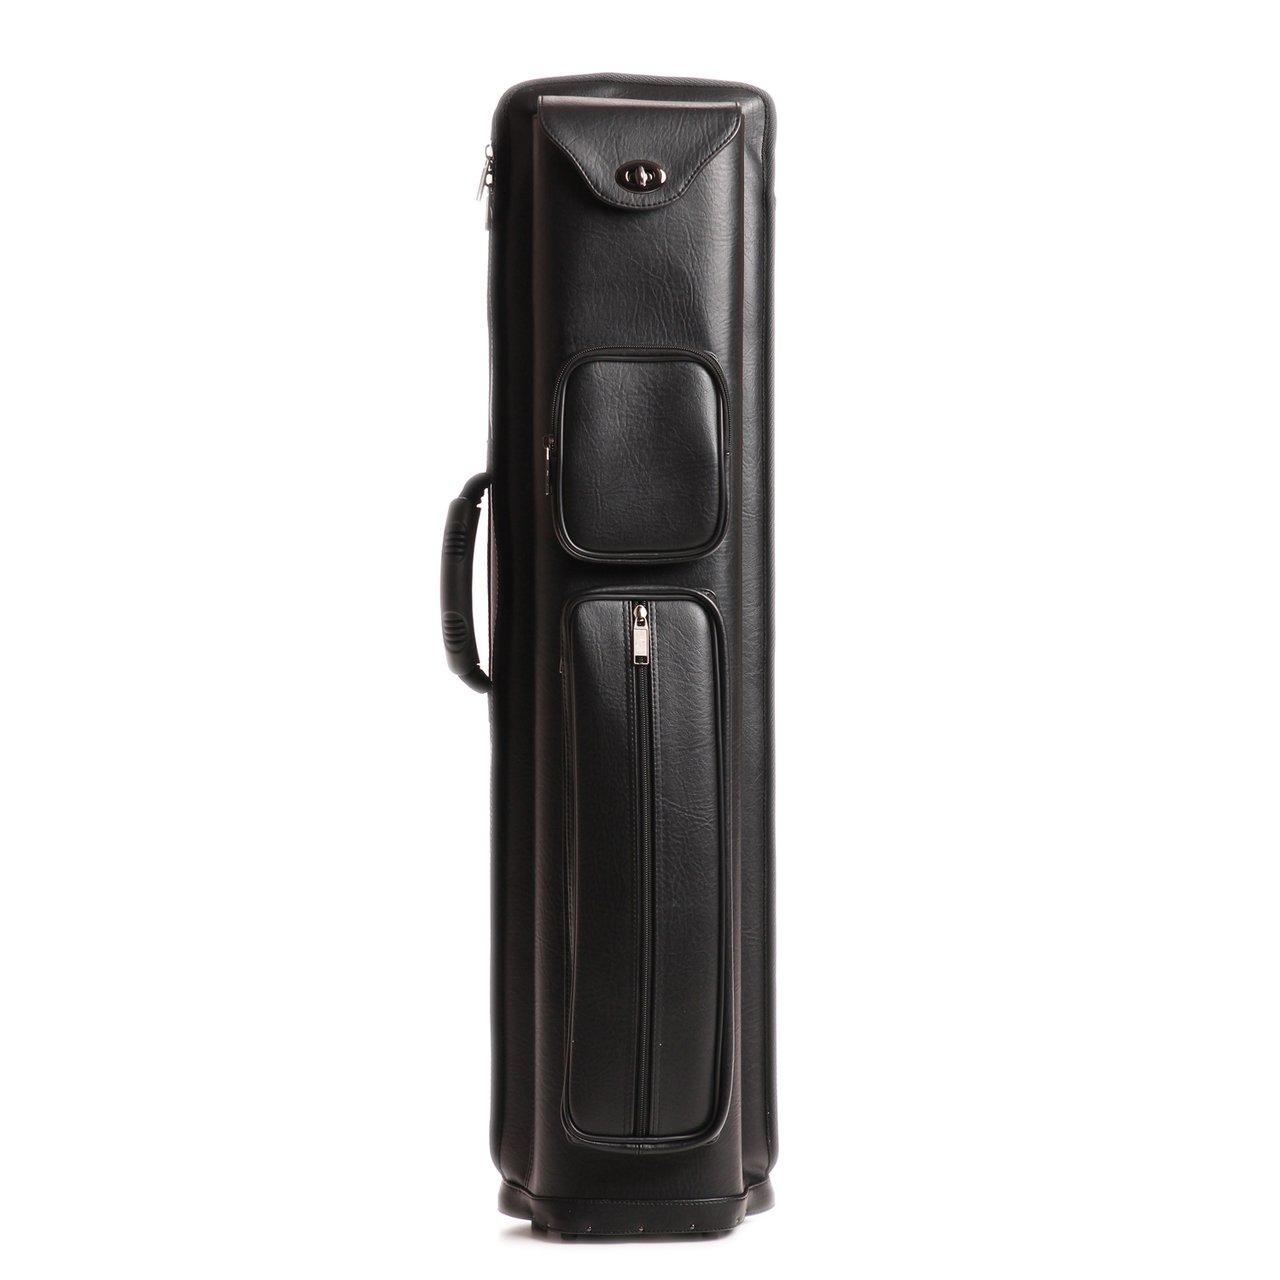 6 Shaft 4 Butt Black Leatherette 4x6 Pro 4B6S Combo Cue Case